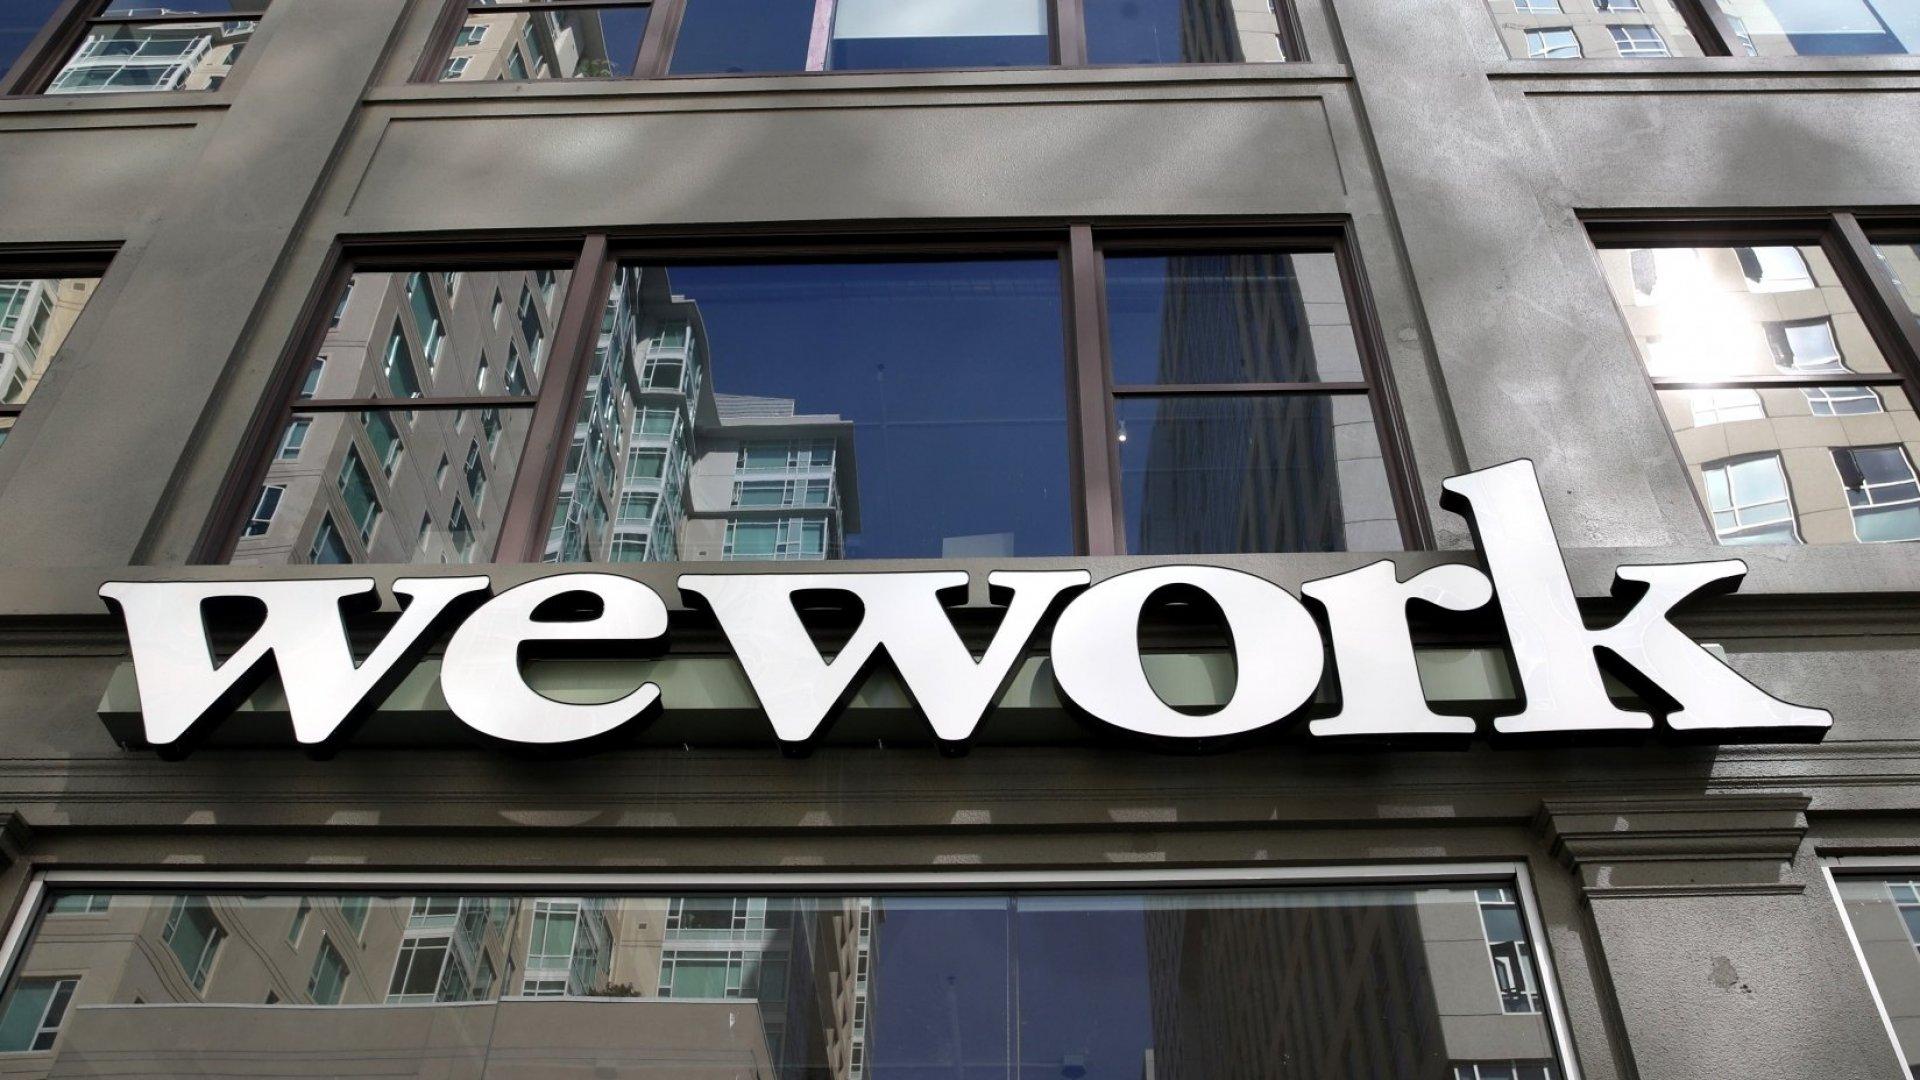 Report: SoftBank to Pay WeWork Founder Adam Neumann $1.7 Billion in Takeover Bid